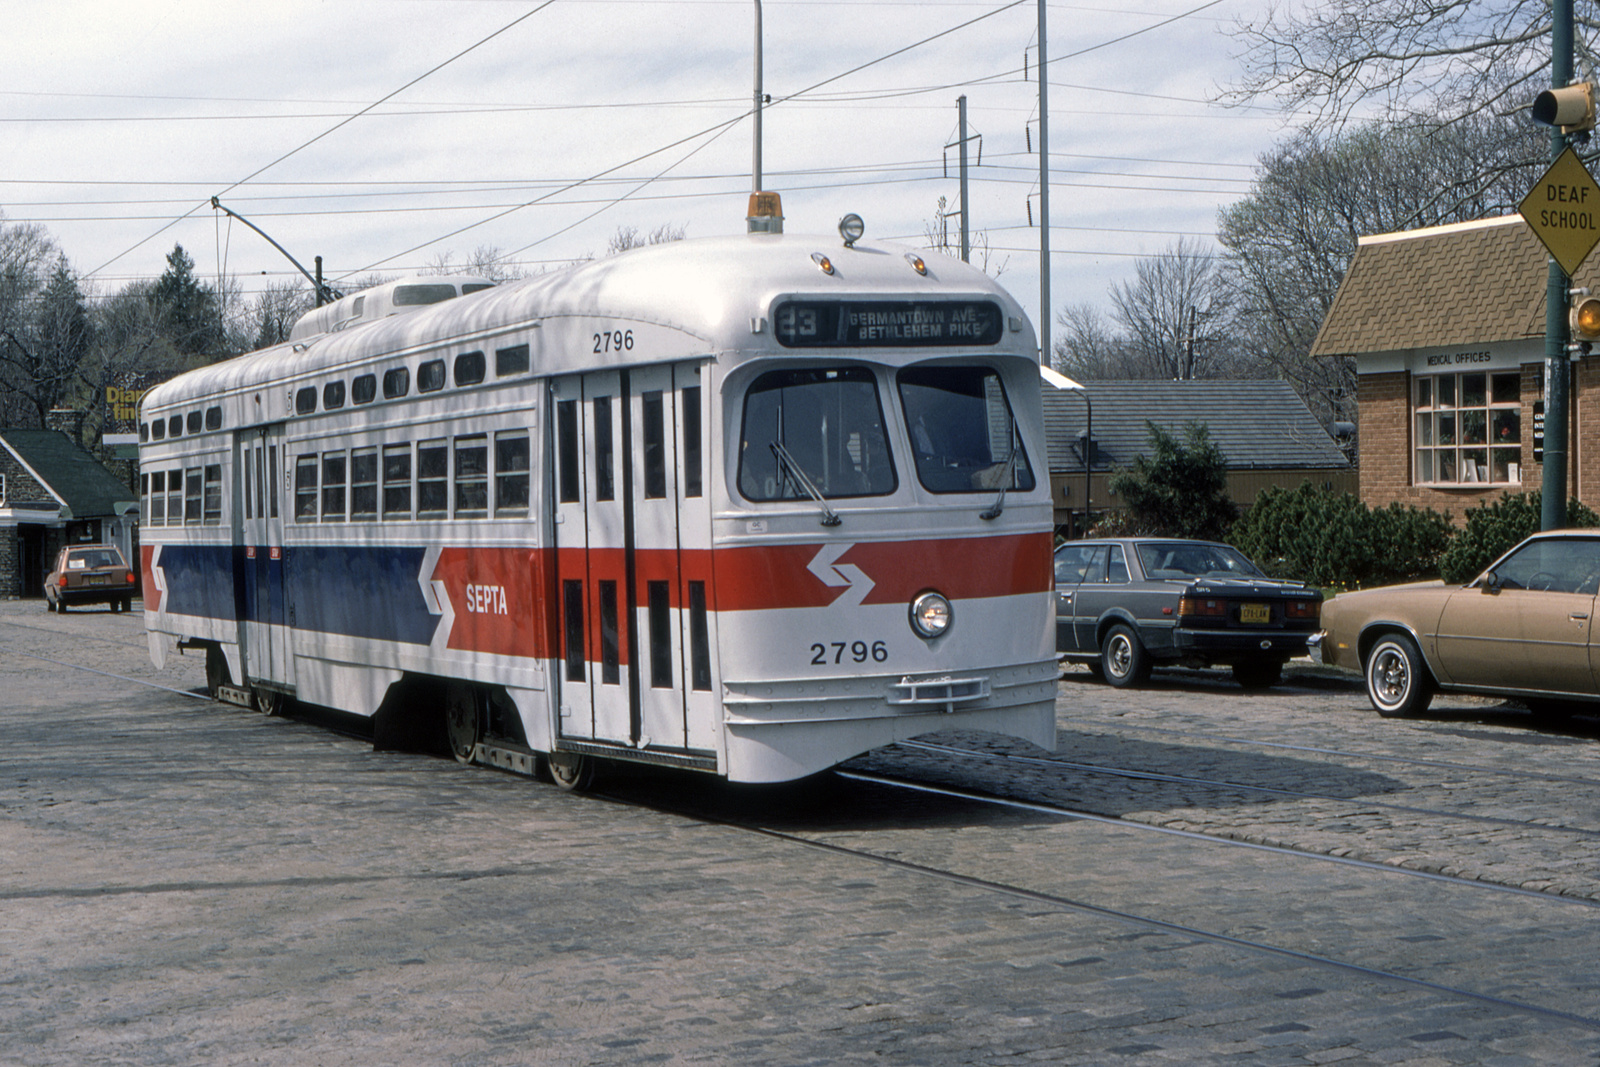 (835k, 1600x1067)<br><b>Country:</b> United States<br><b>City:</b> Philadelphia, PA<br><b>System:</b> SEPTA (or Predecessor)<br><b>Line:</b> Rt. 23-Germantown<br><b>Location:</b> Germantown/n. of Roumfort (Trolley Car Diner)<br><b>Car:</b> PTC/SEPTA Postwar All-electric PCC (St.Louis, 1947) 2796 <br><b>Collection of:</b> David Pirmann<br><b>Date:</b> 5/1984<br><b>Viewed (this week/total):</b> 0 / 56